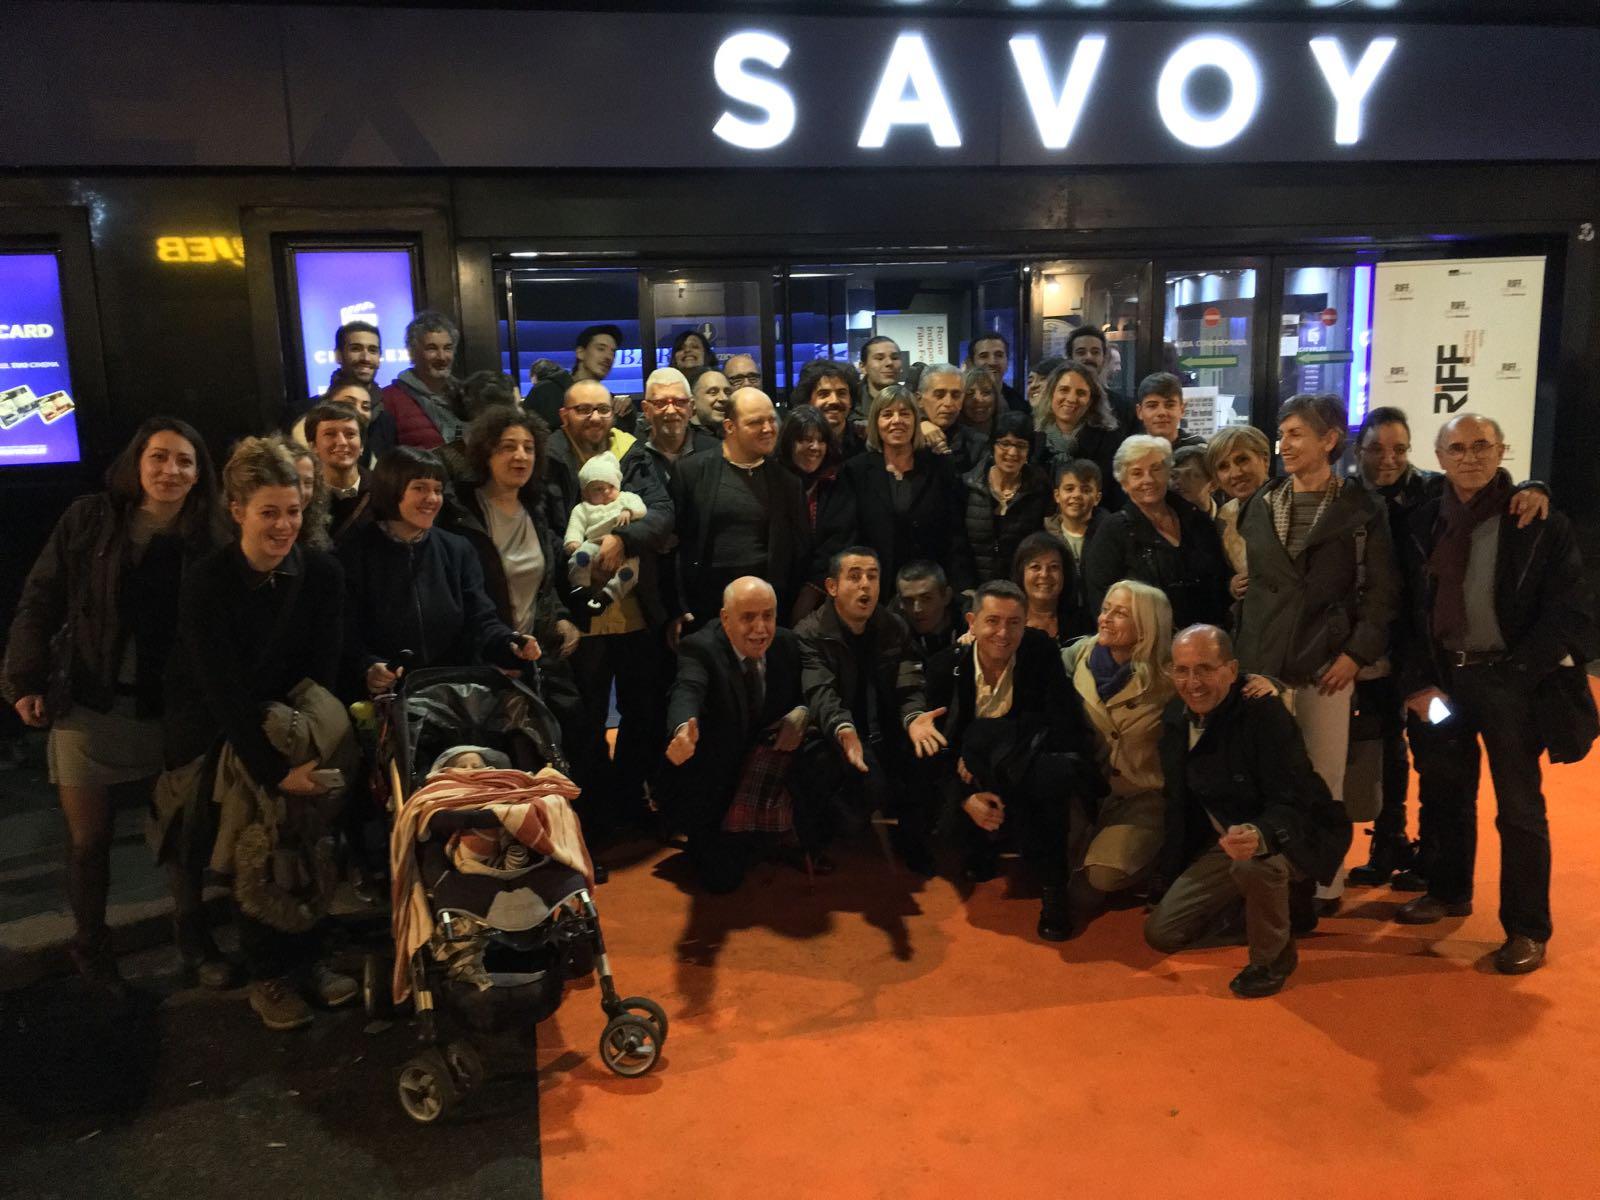 cinema-savoy